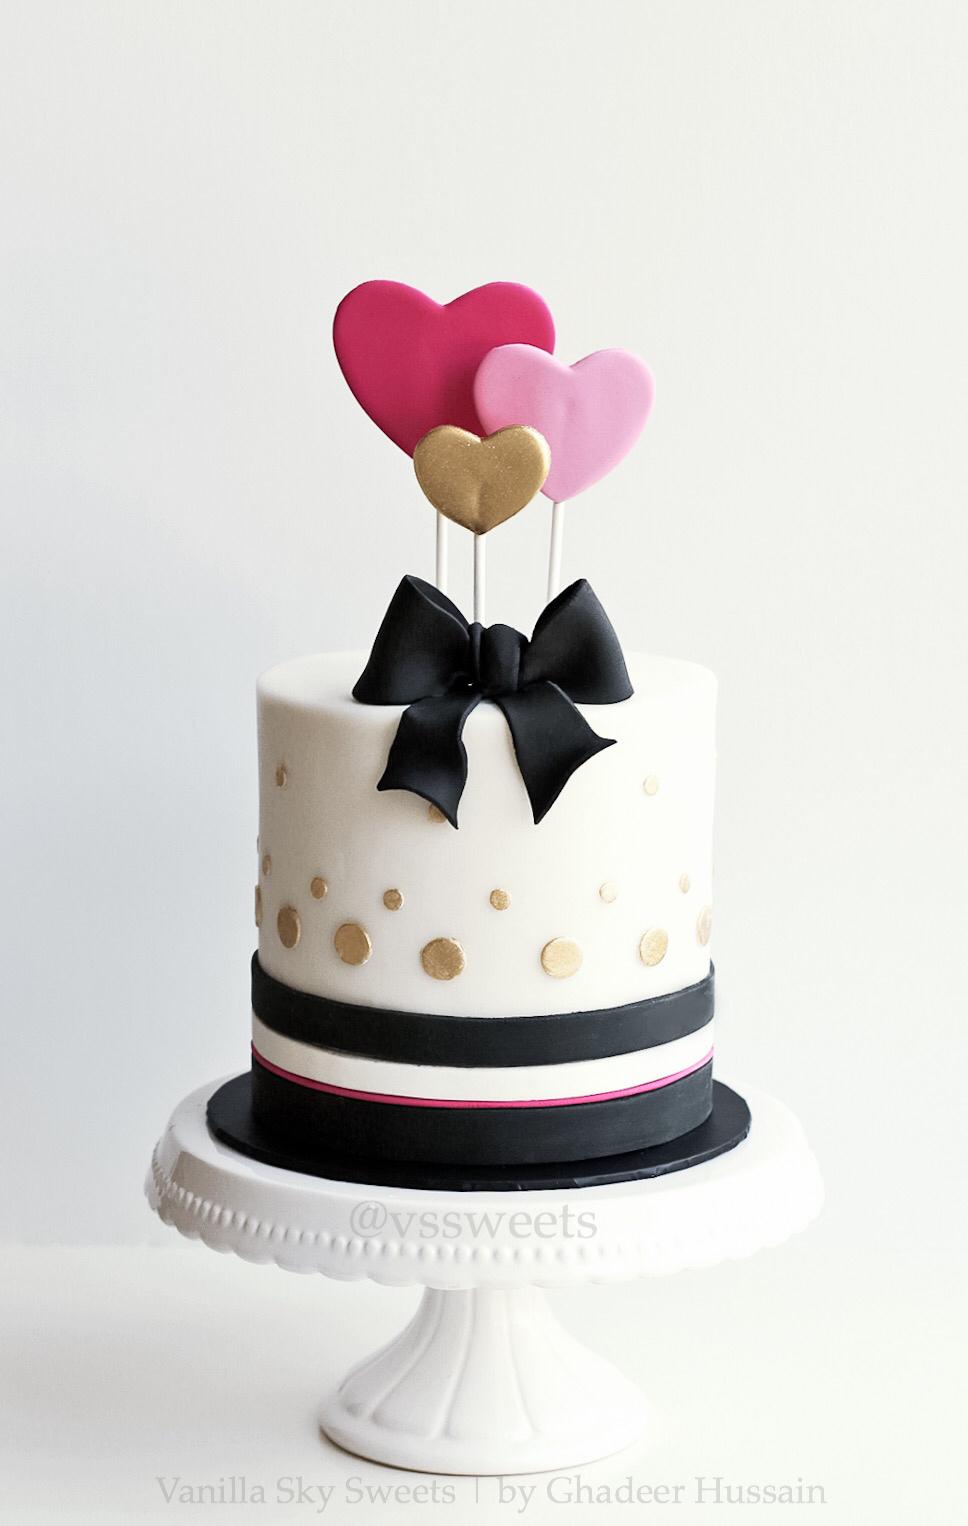 Black and white polka dot heart cake